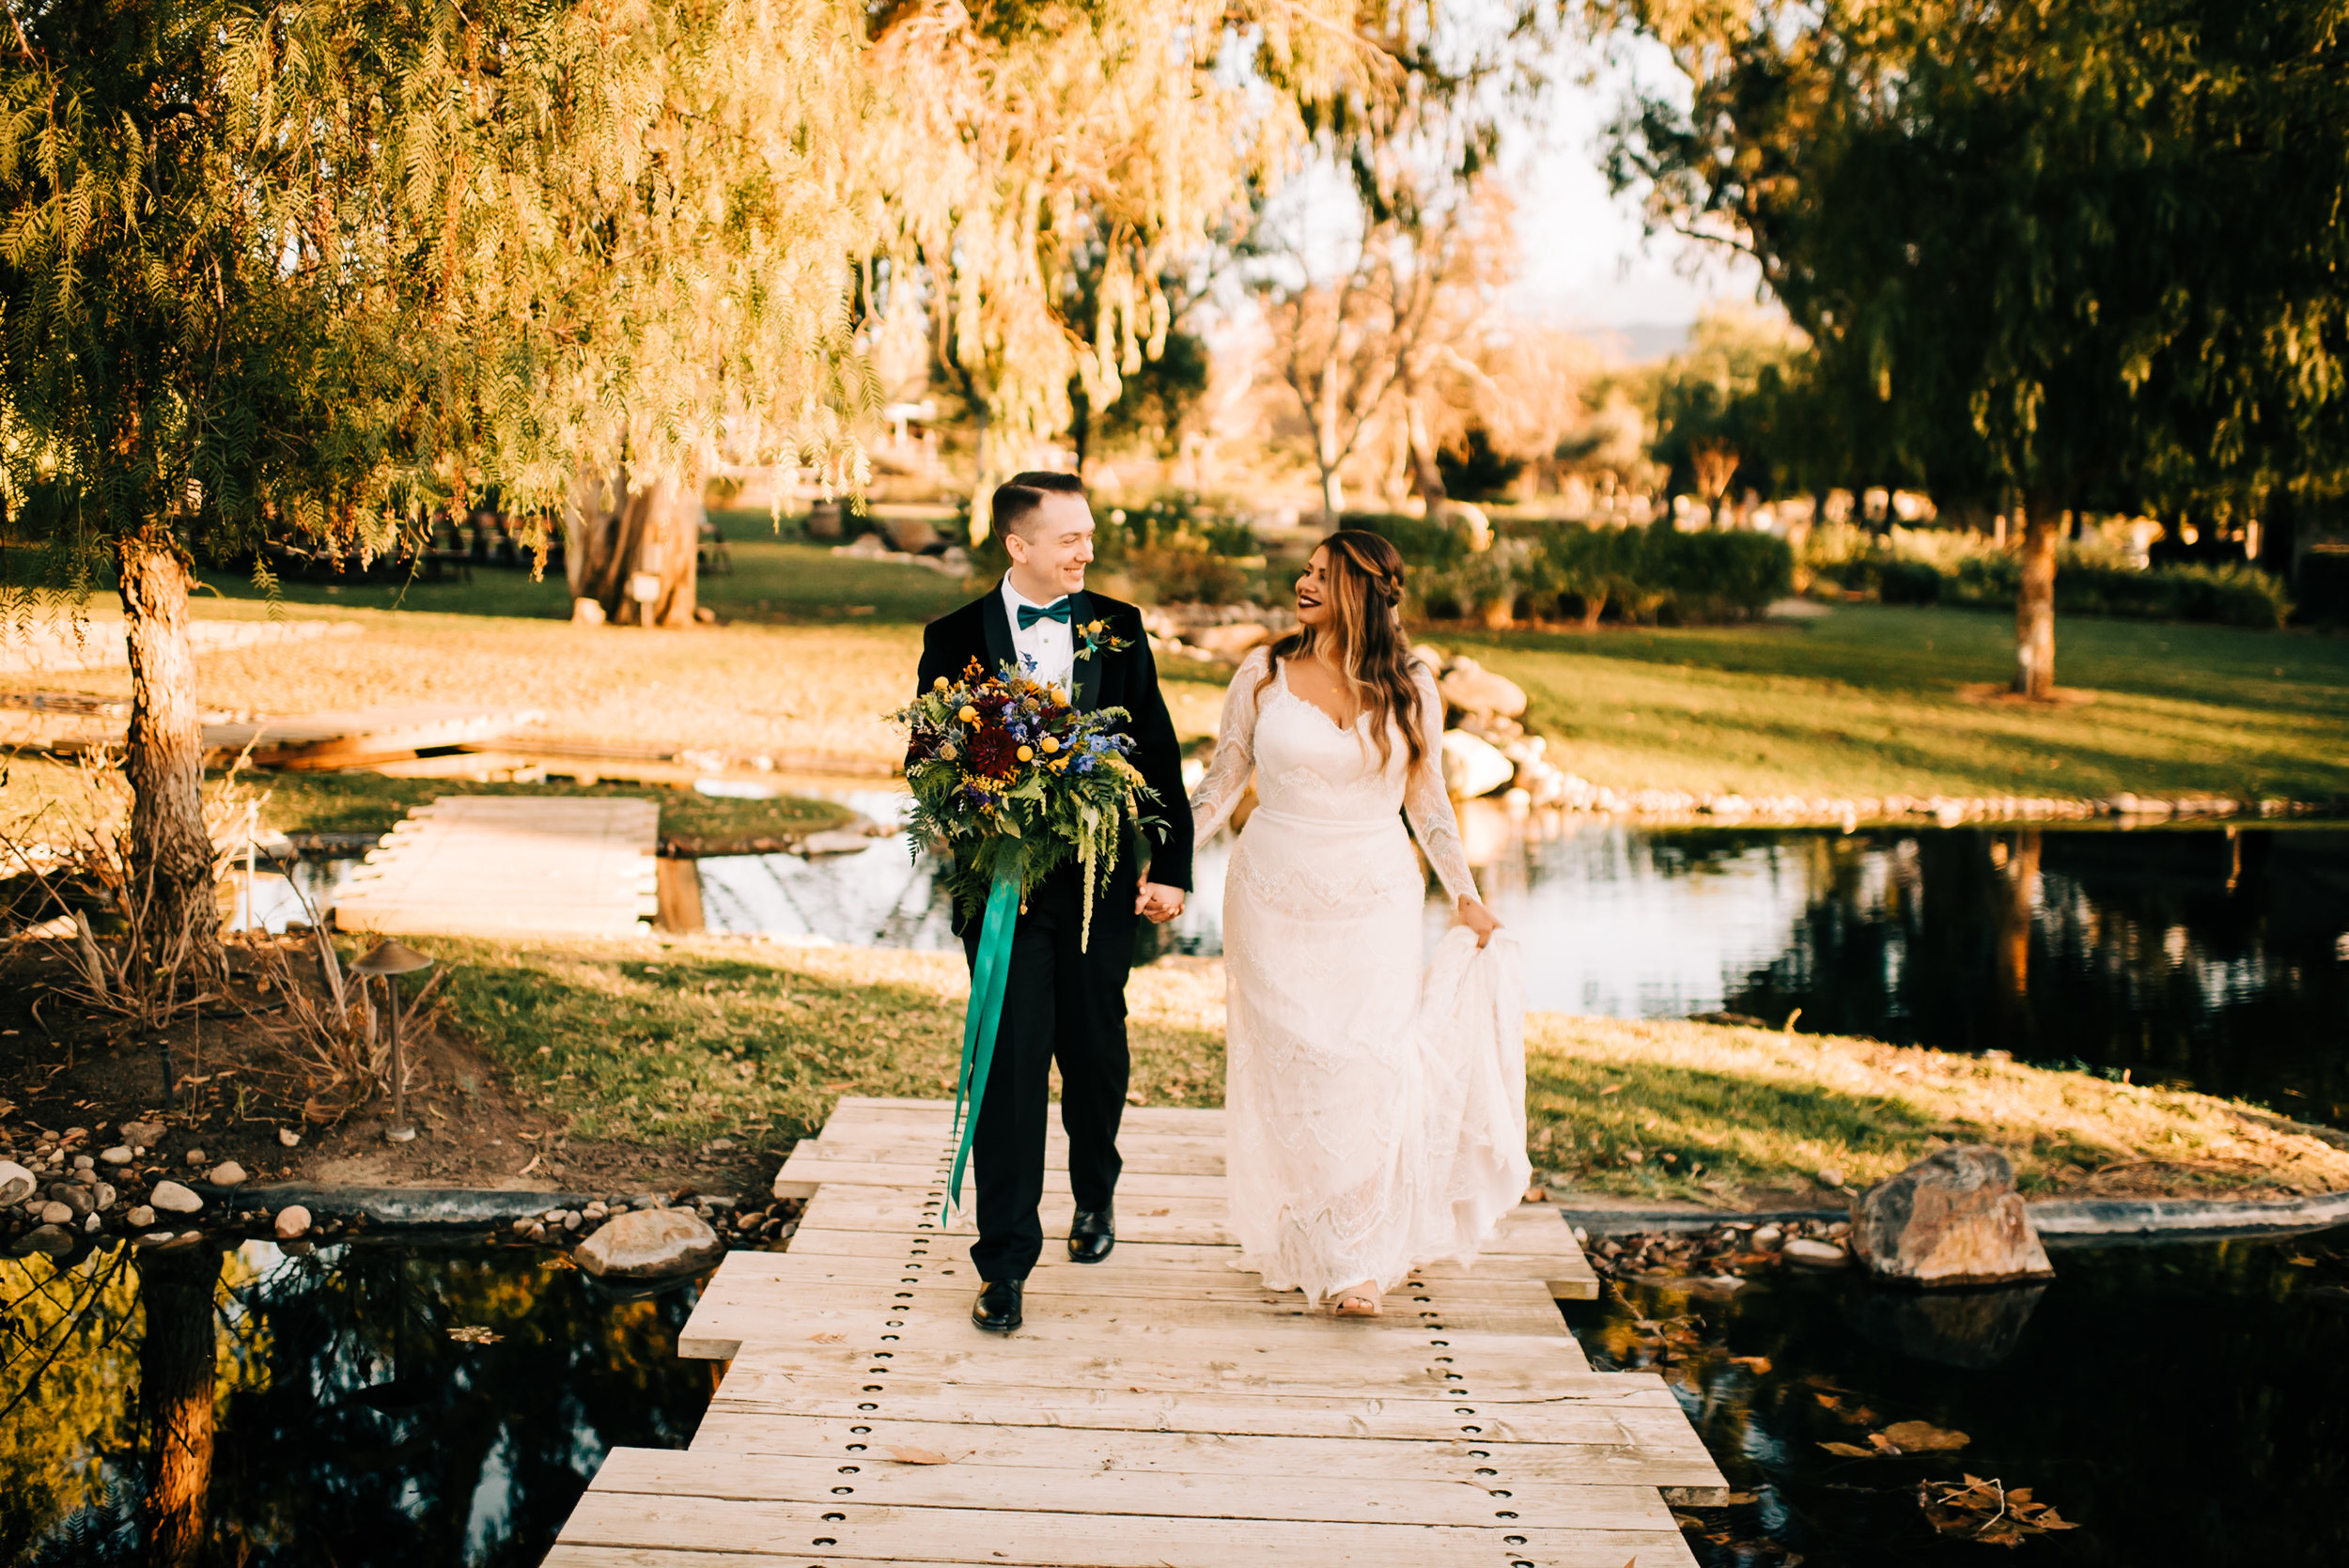 bay area nontraditional wedding photographer southern california boho wedding love light magic san francisco oakland northern california-773.jpg